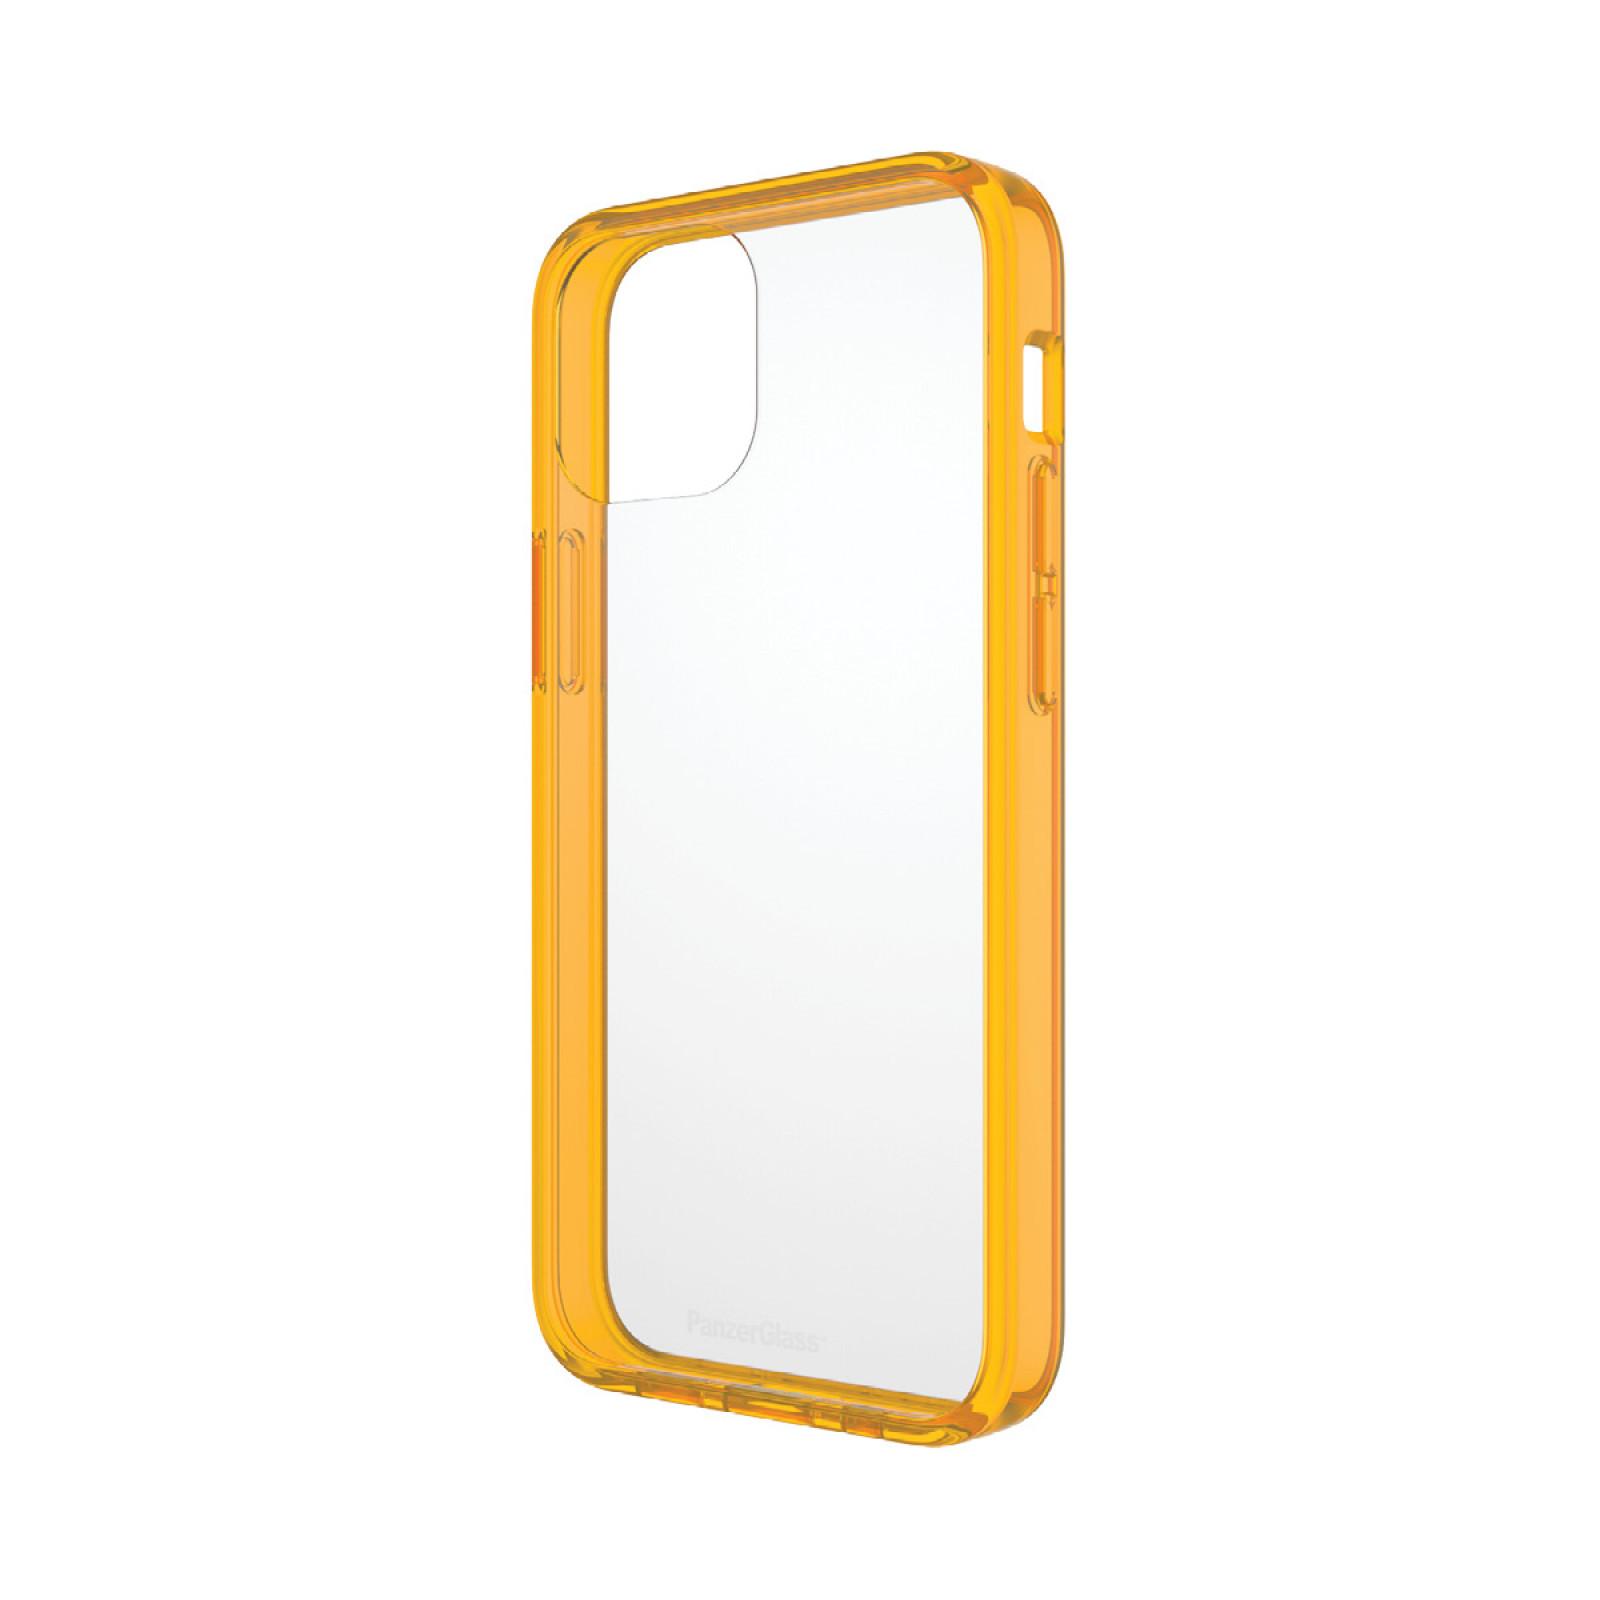 Гръб PanzerGlass за IPhone 13 mini, ClearCase - Оранжева рамка